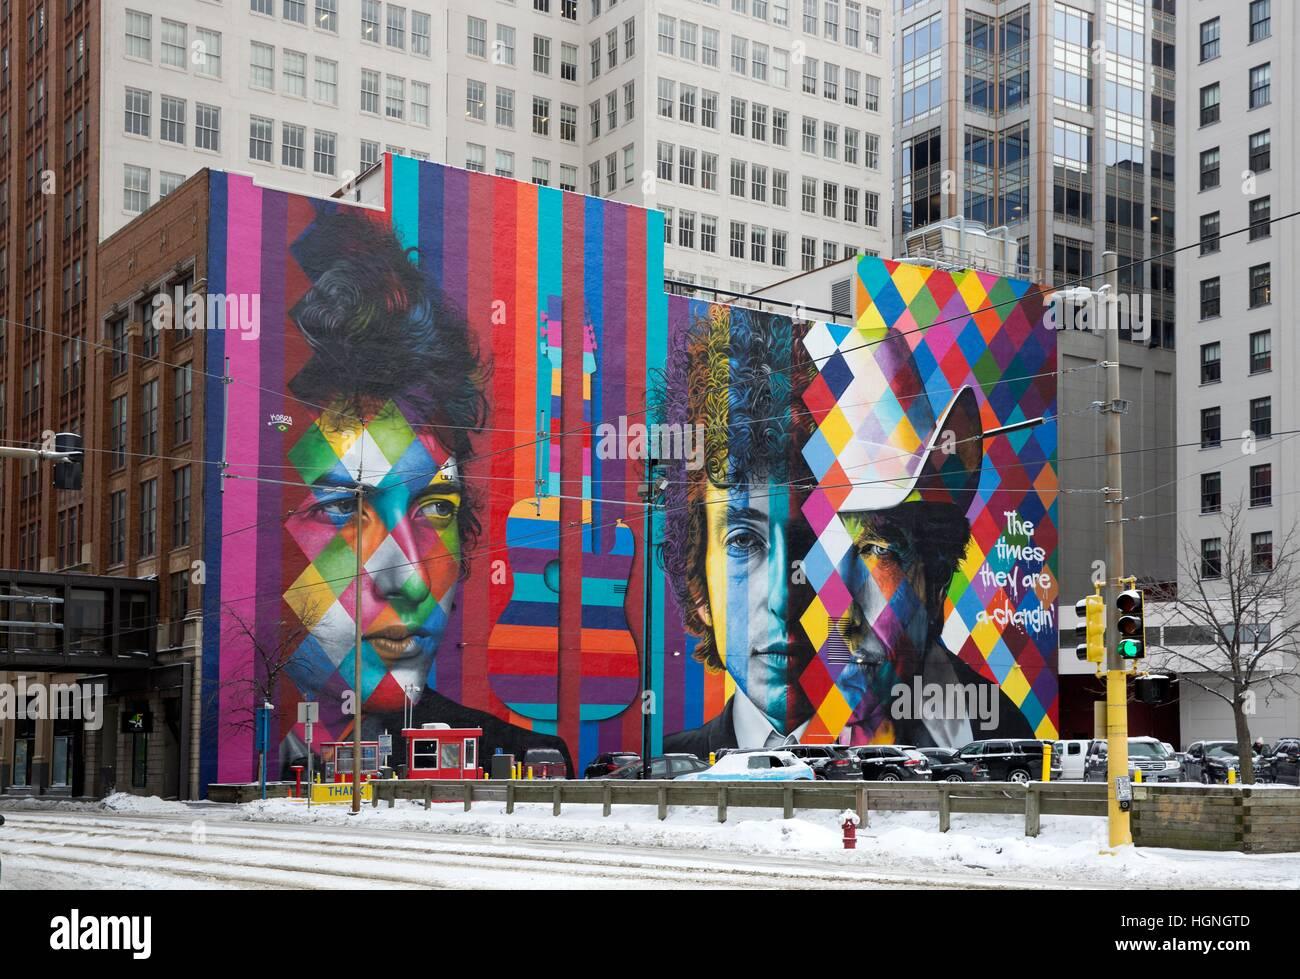 Mural of Bob Dylan by Brazilian artist Eduardo Kobra in downtown Minneapolis, Minnesota - Stock Image